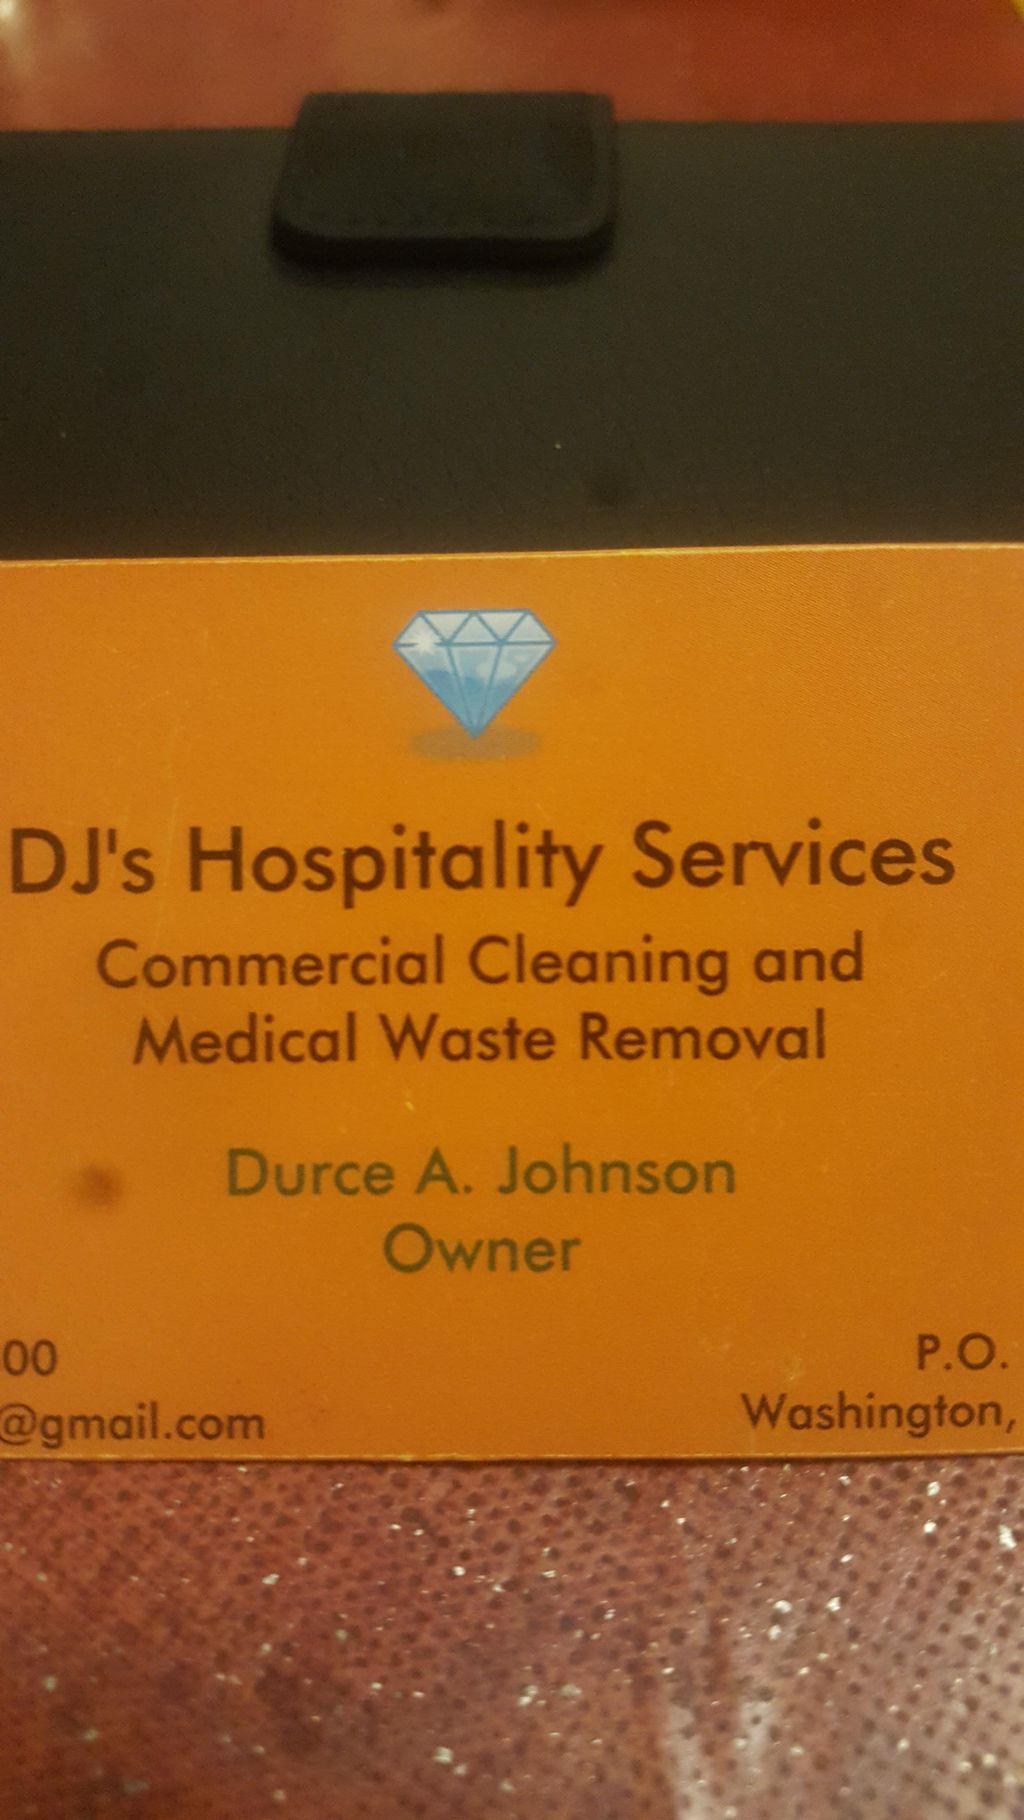 DJ's Hospitality Services